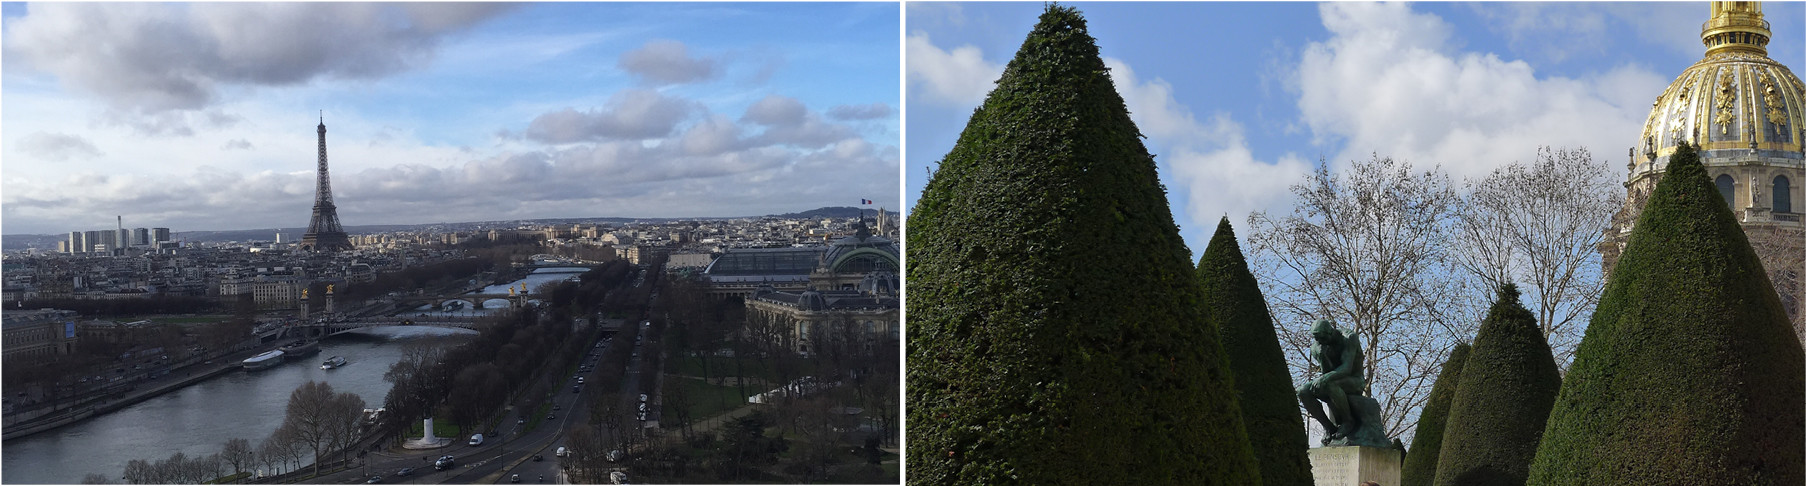 Eiffel-Tower-Rodin-Museum